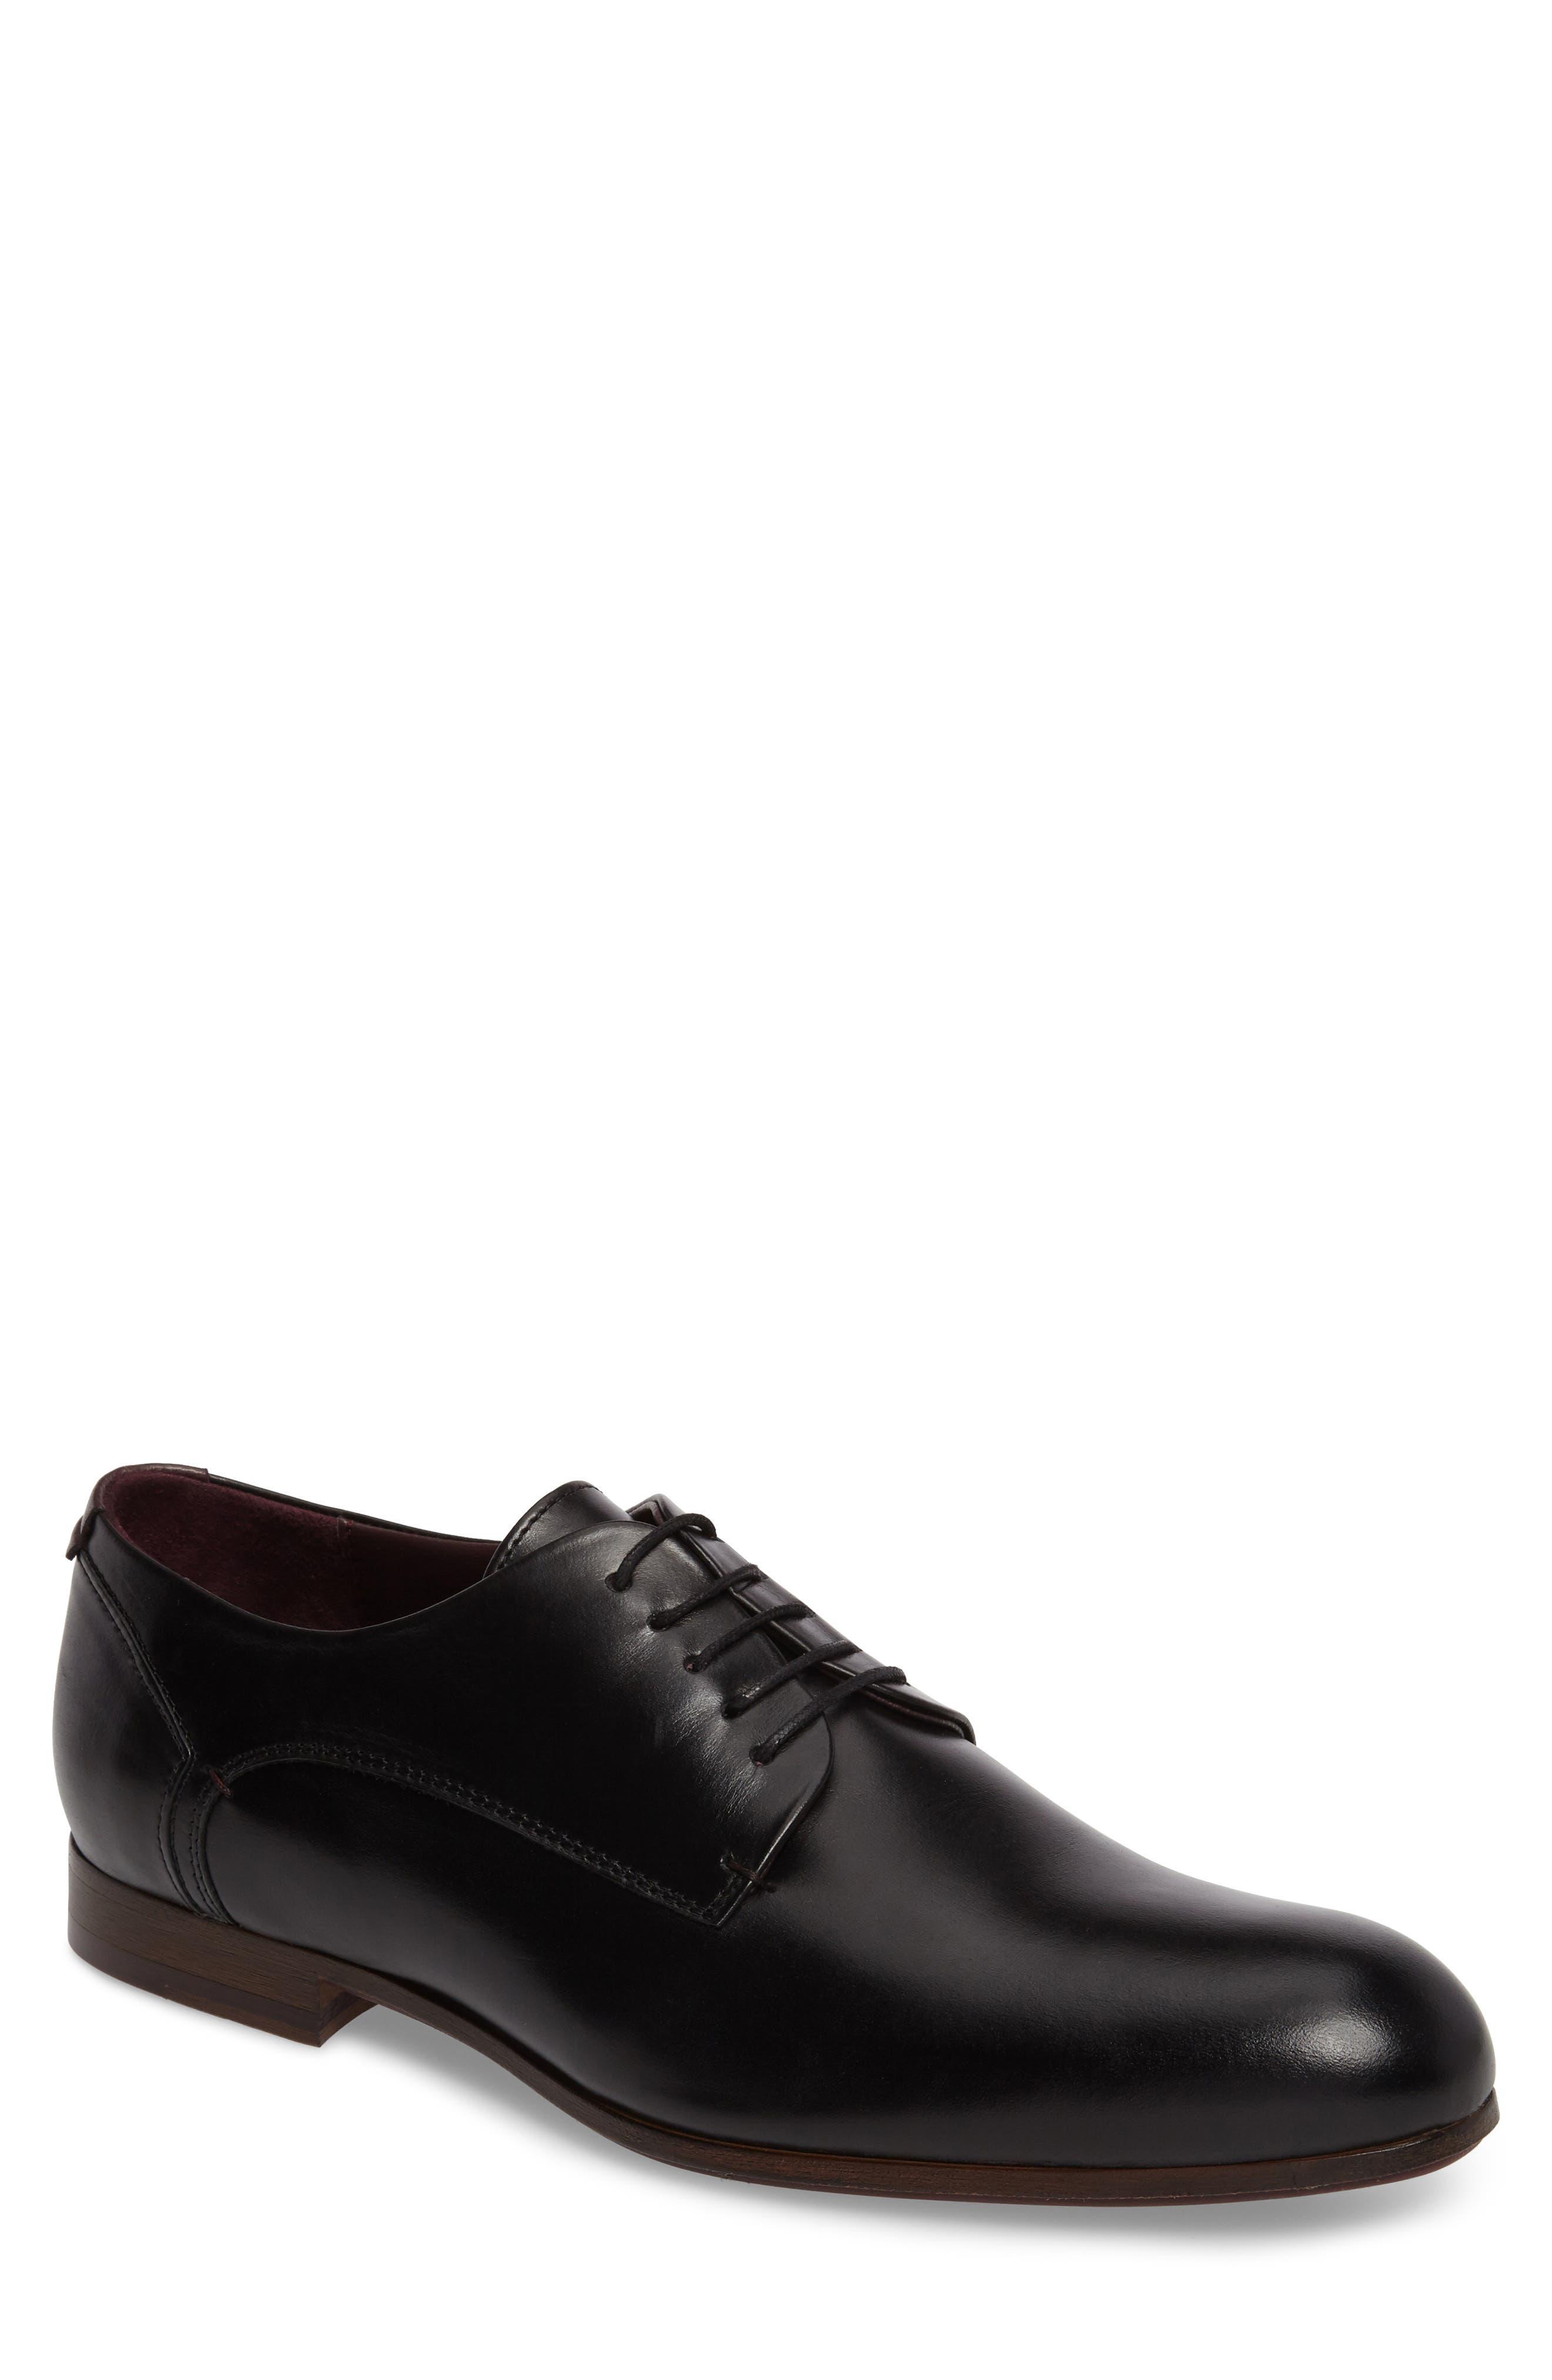 Avionn Plain Toe Derby,                             Main thumbnail 1, color,                             Black Leather